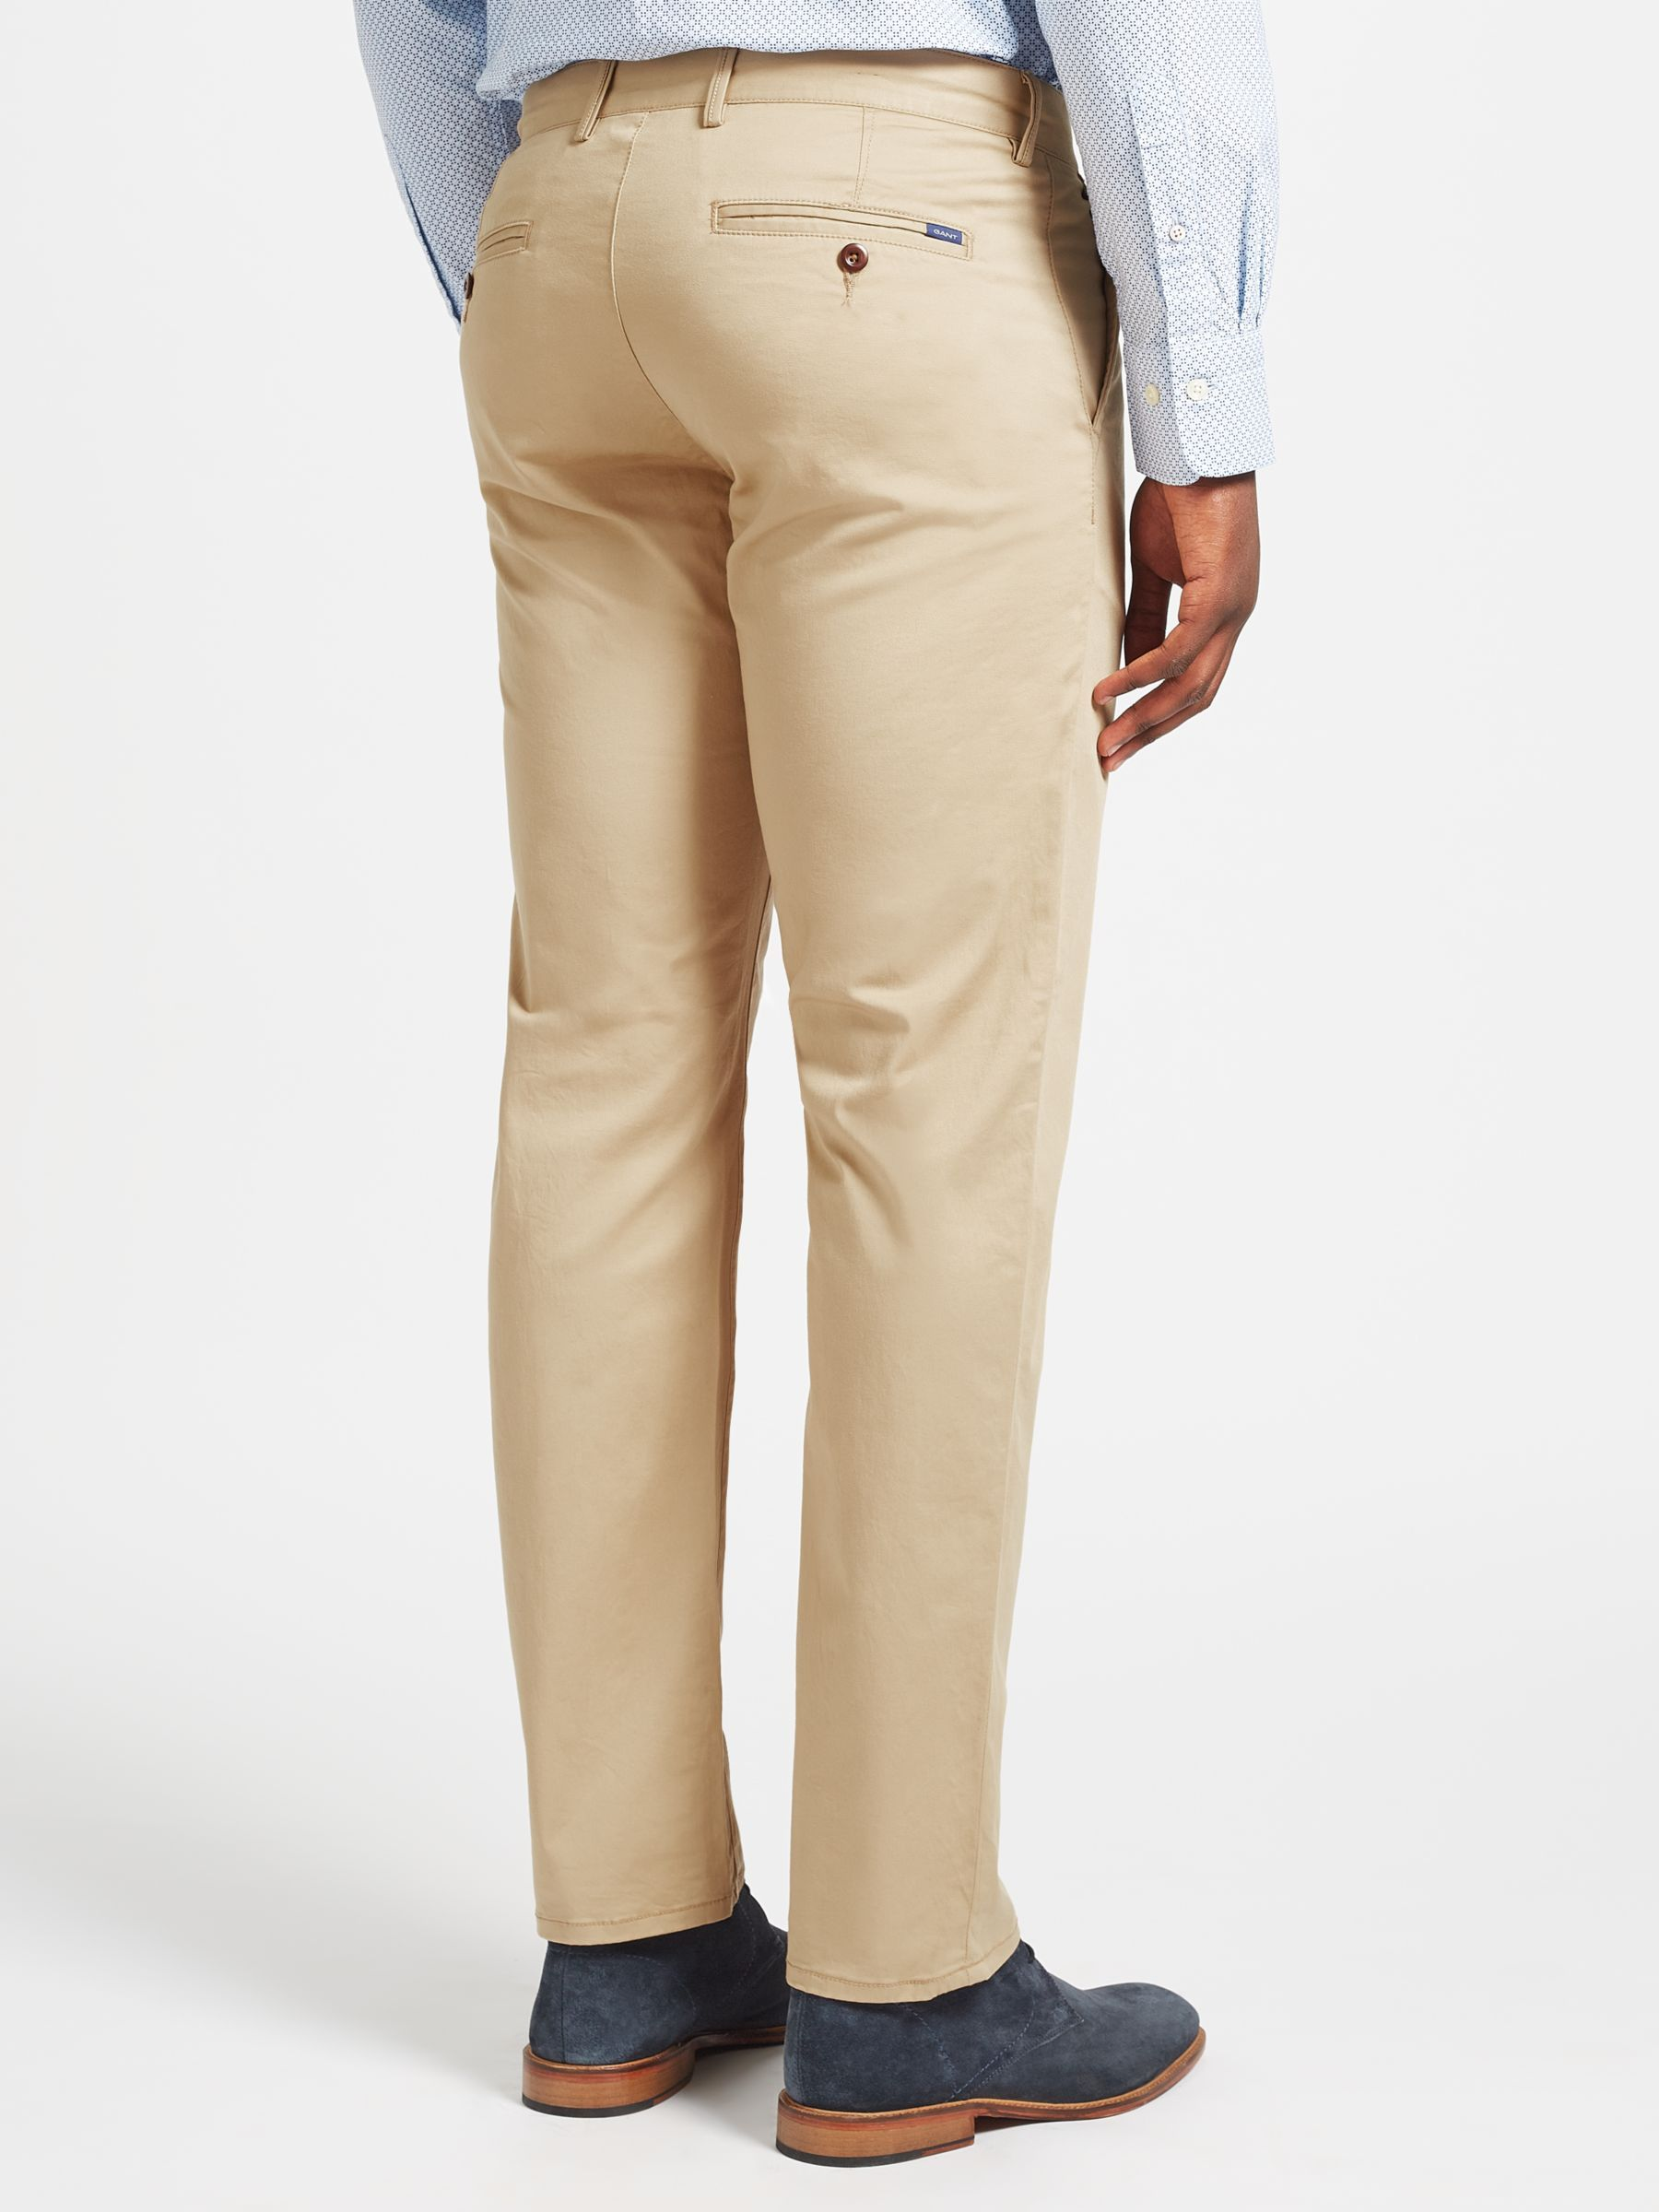 lågt pris låga priser super billigt GANT Regular Twill Chino Trousers | Trousers, Timeless fashion, Casual